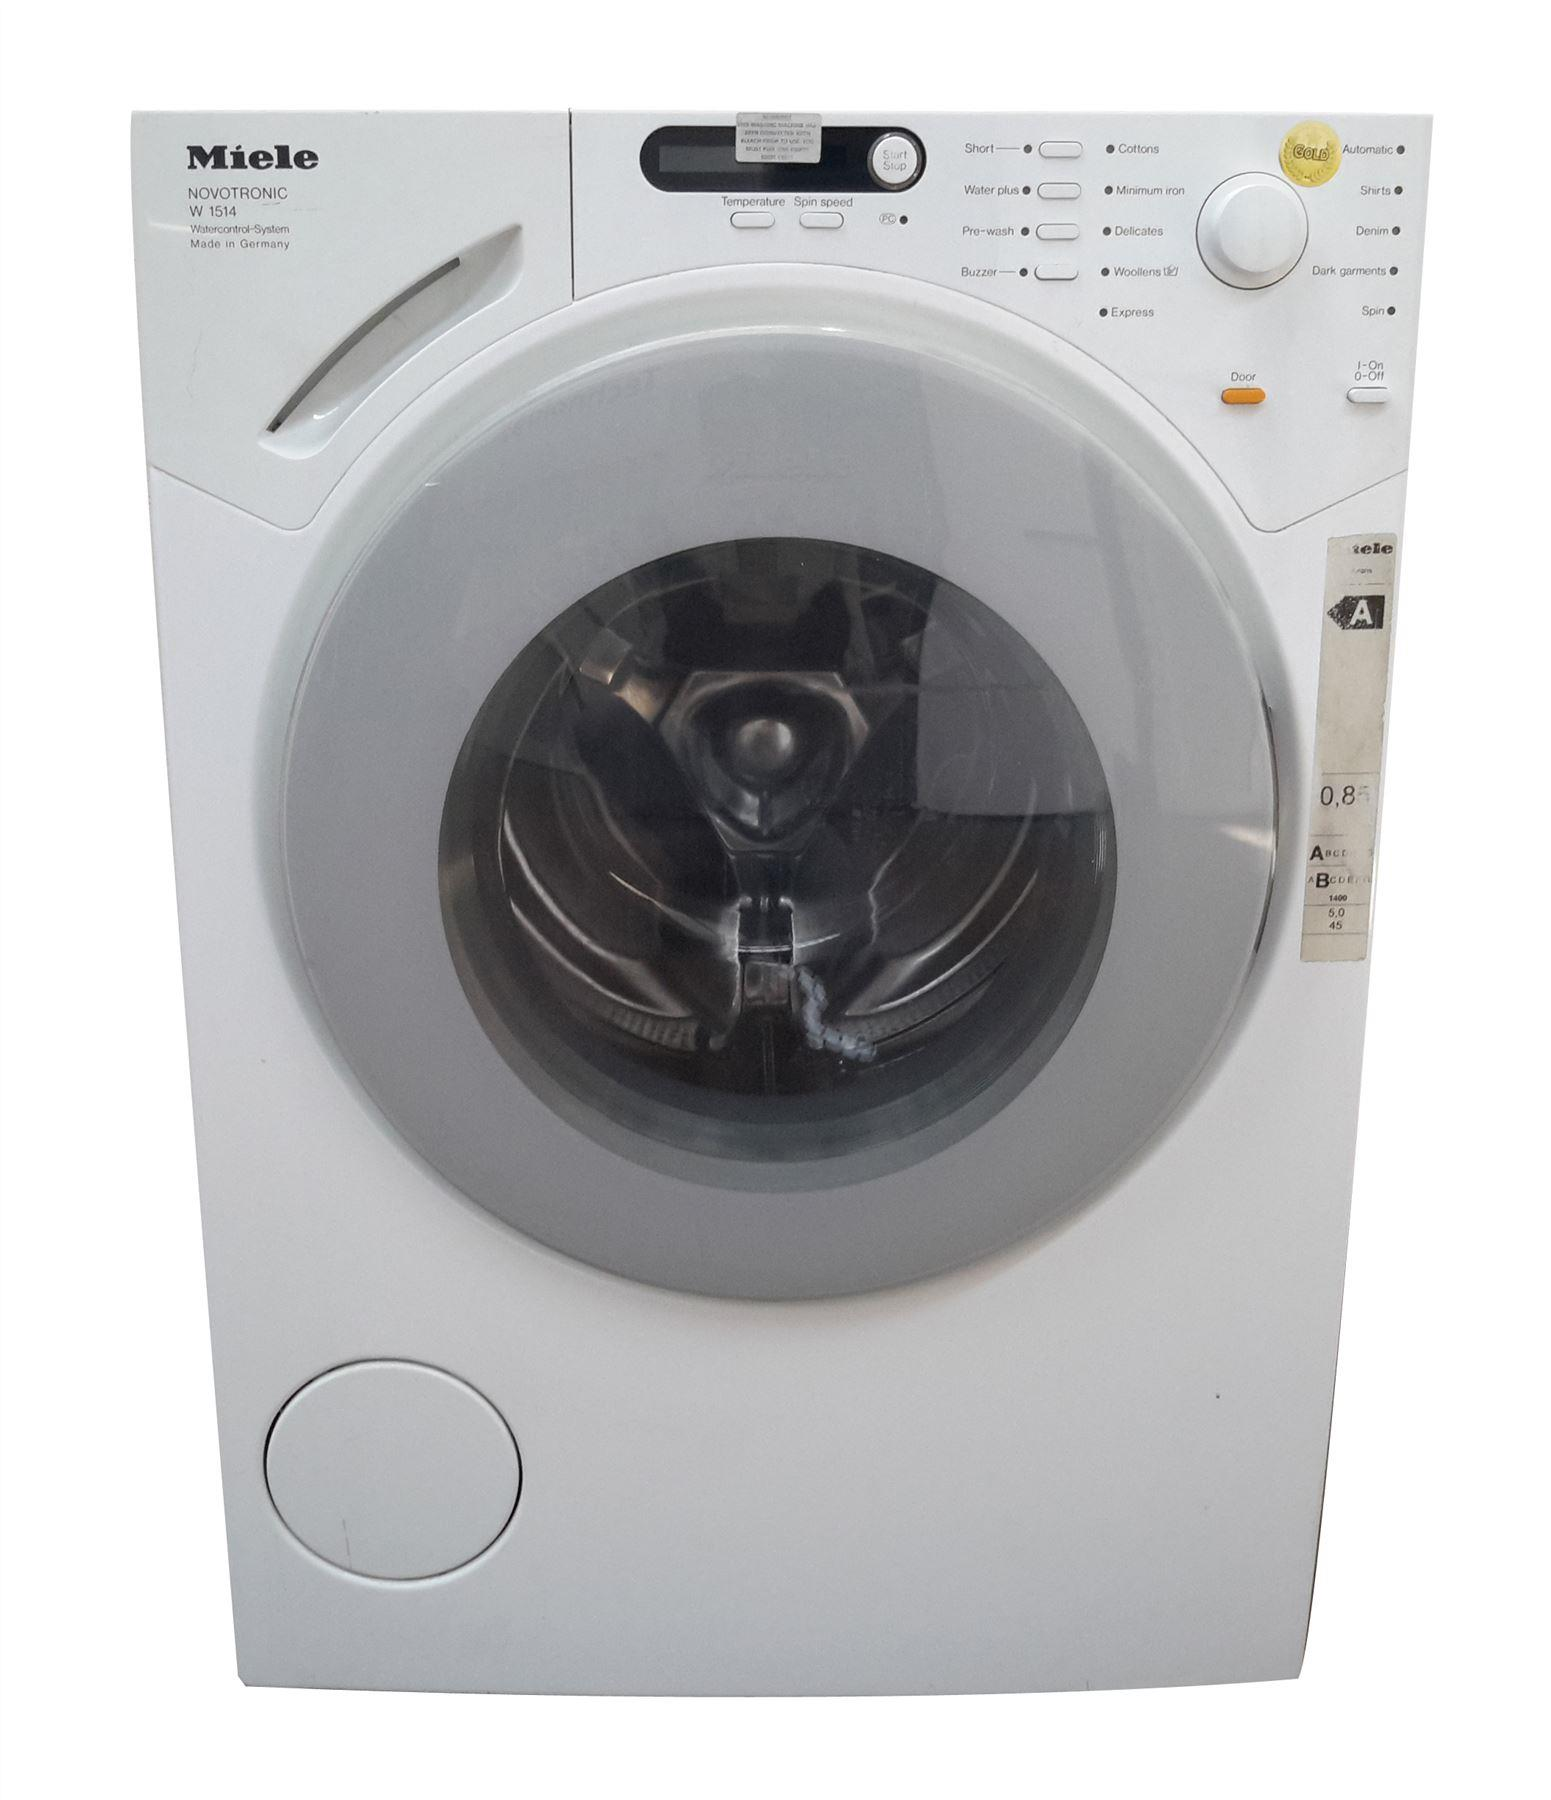 miele w1514 1400rpm 5kg washing machine online store. Black Bedroom Furniture Sets. Home Design Ideas